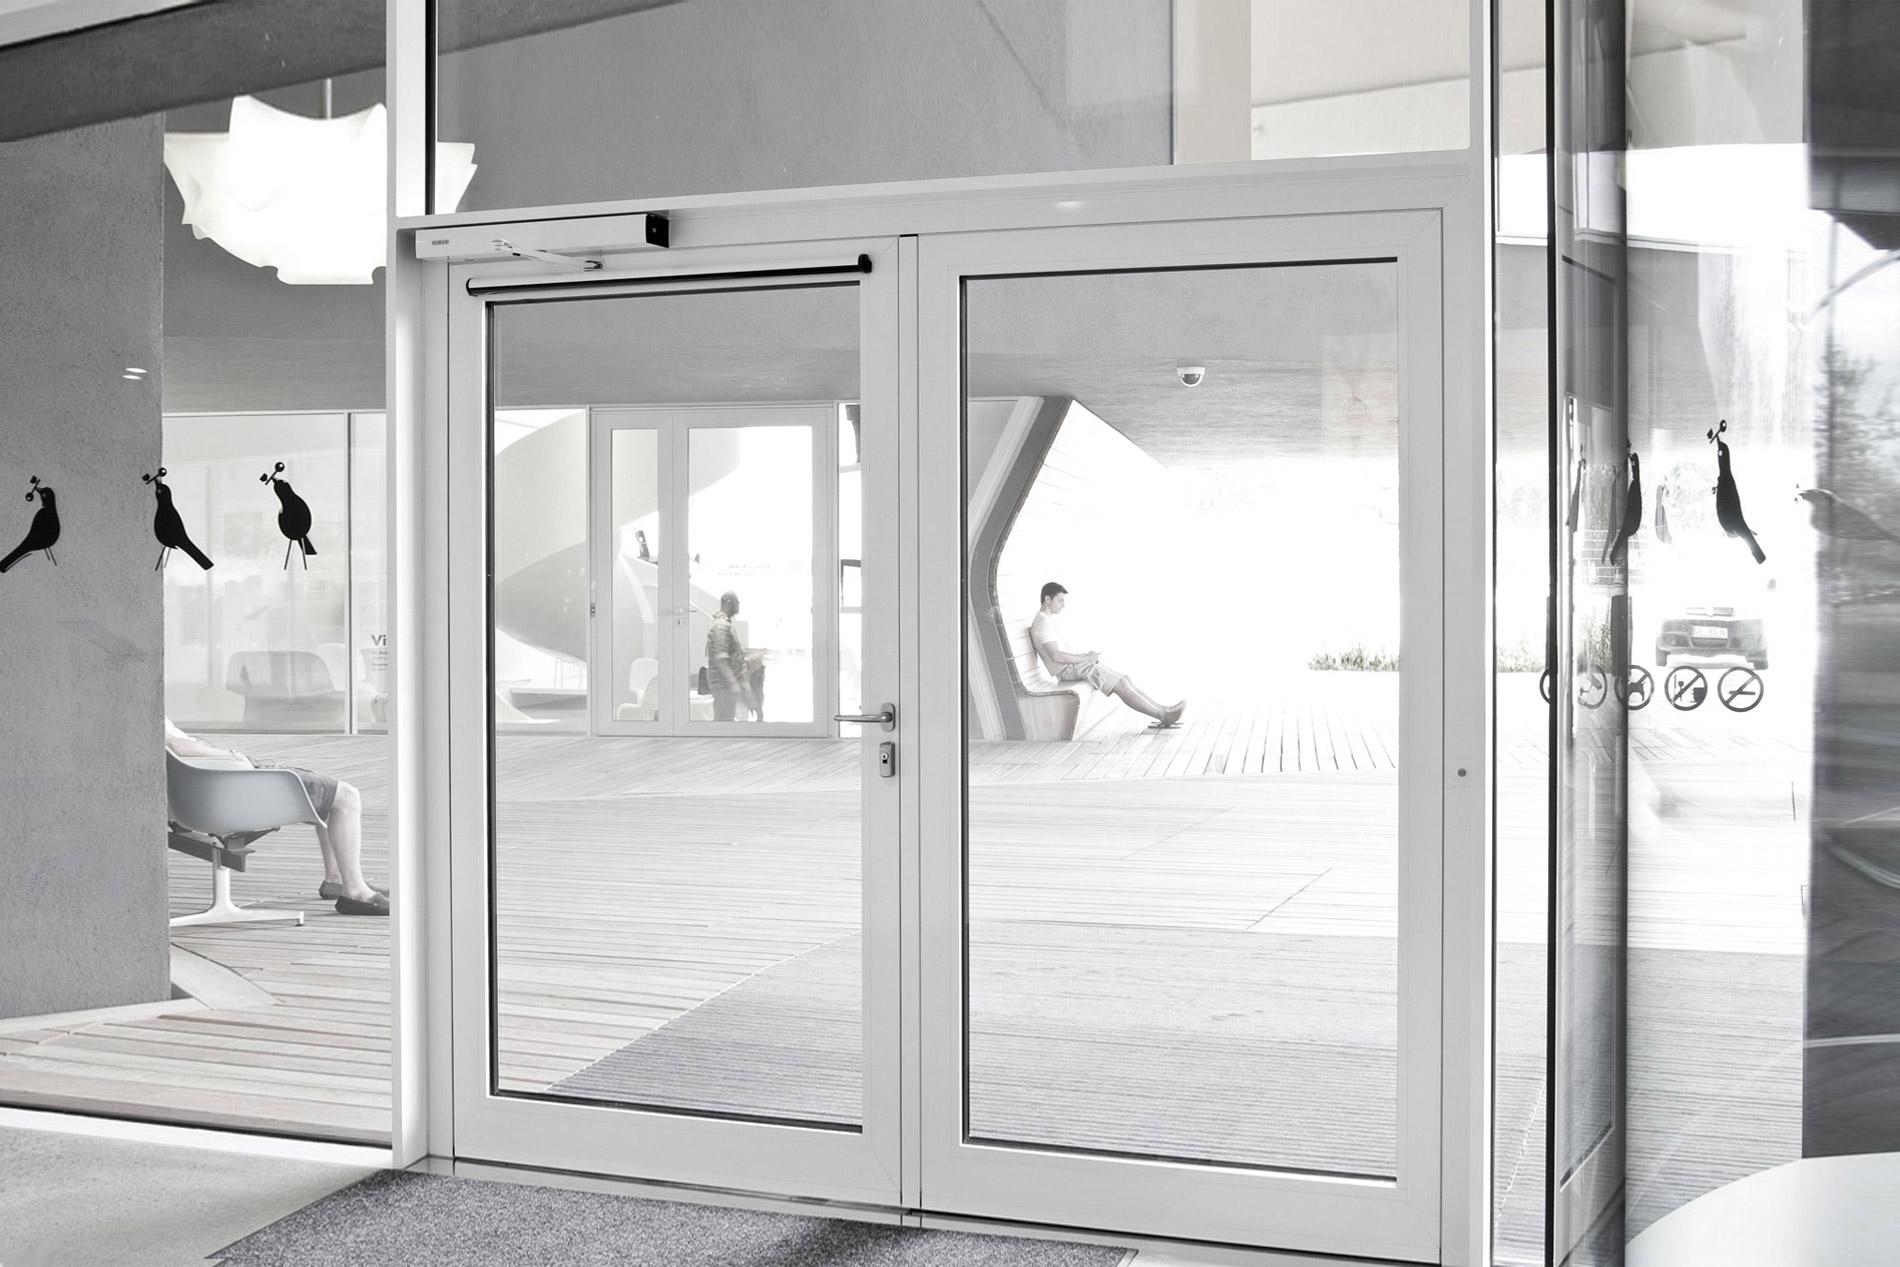 Rohrrahmentüren | Wolgast Türen